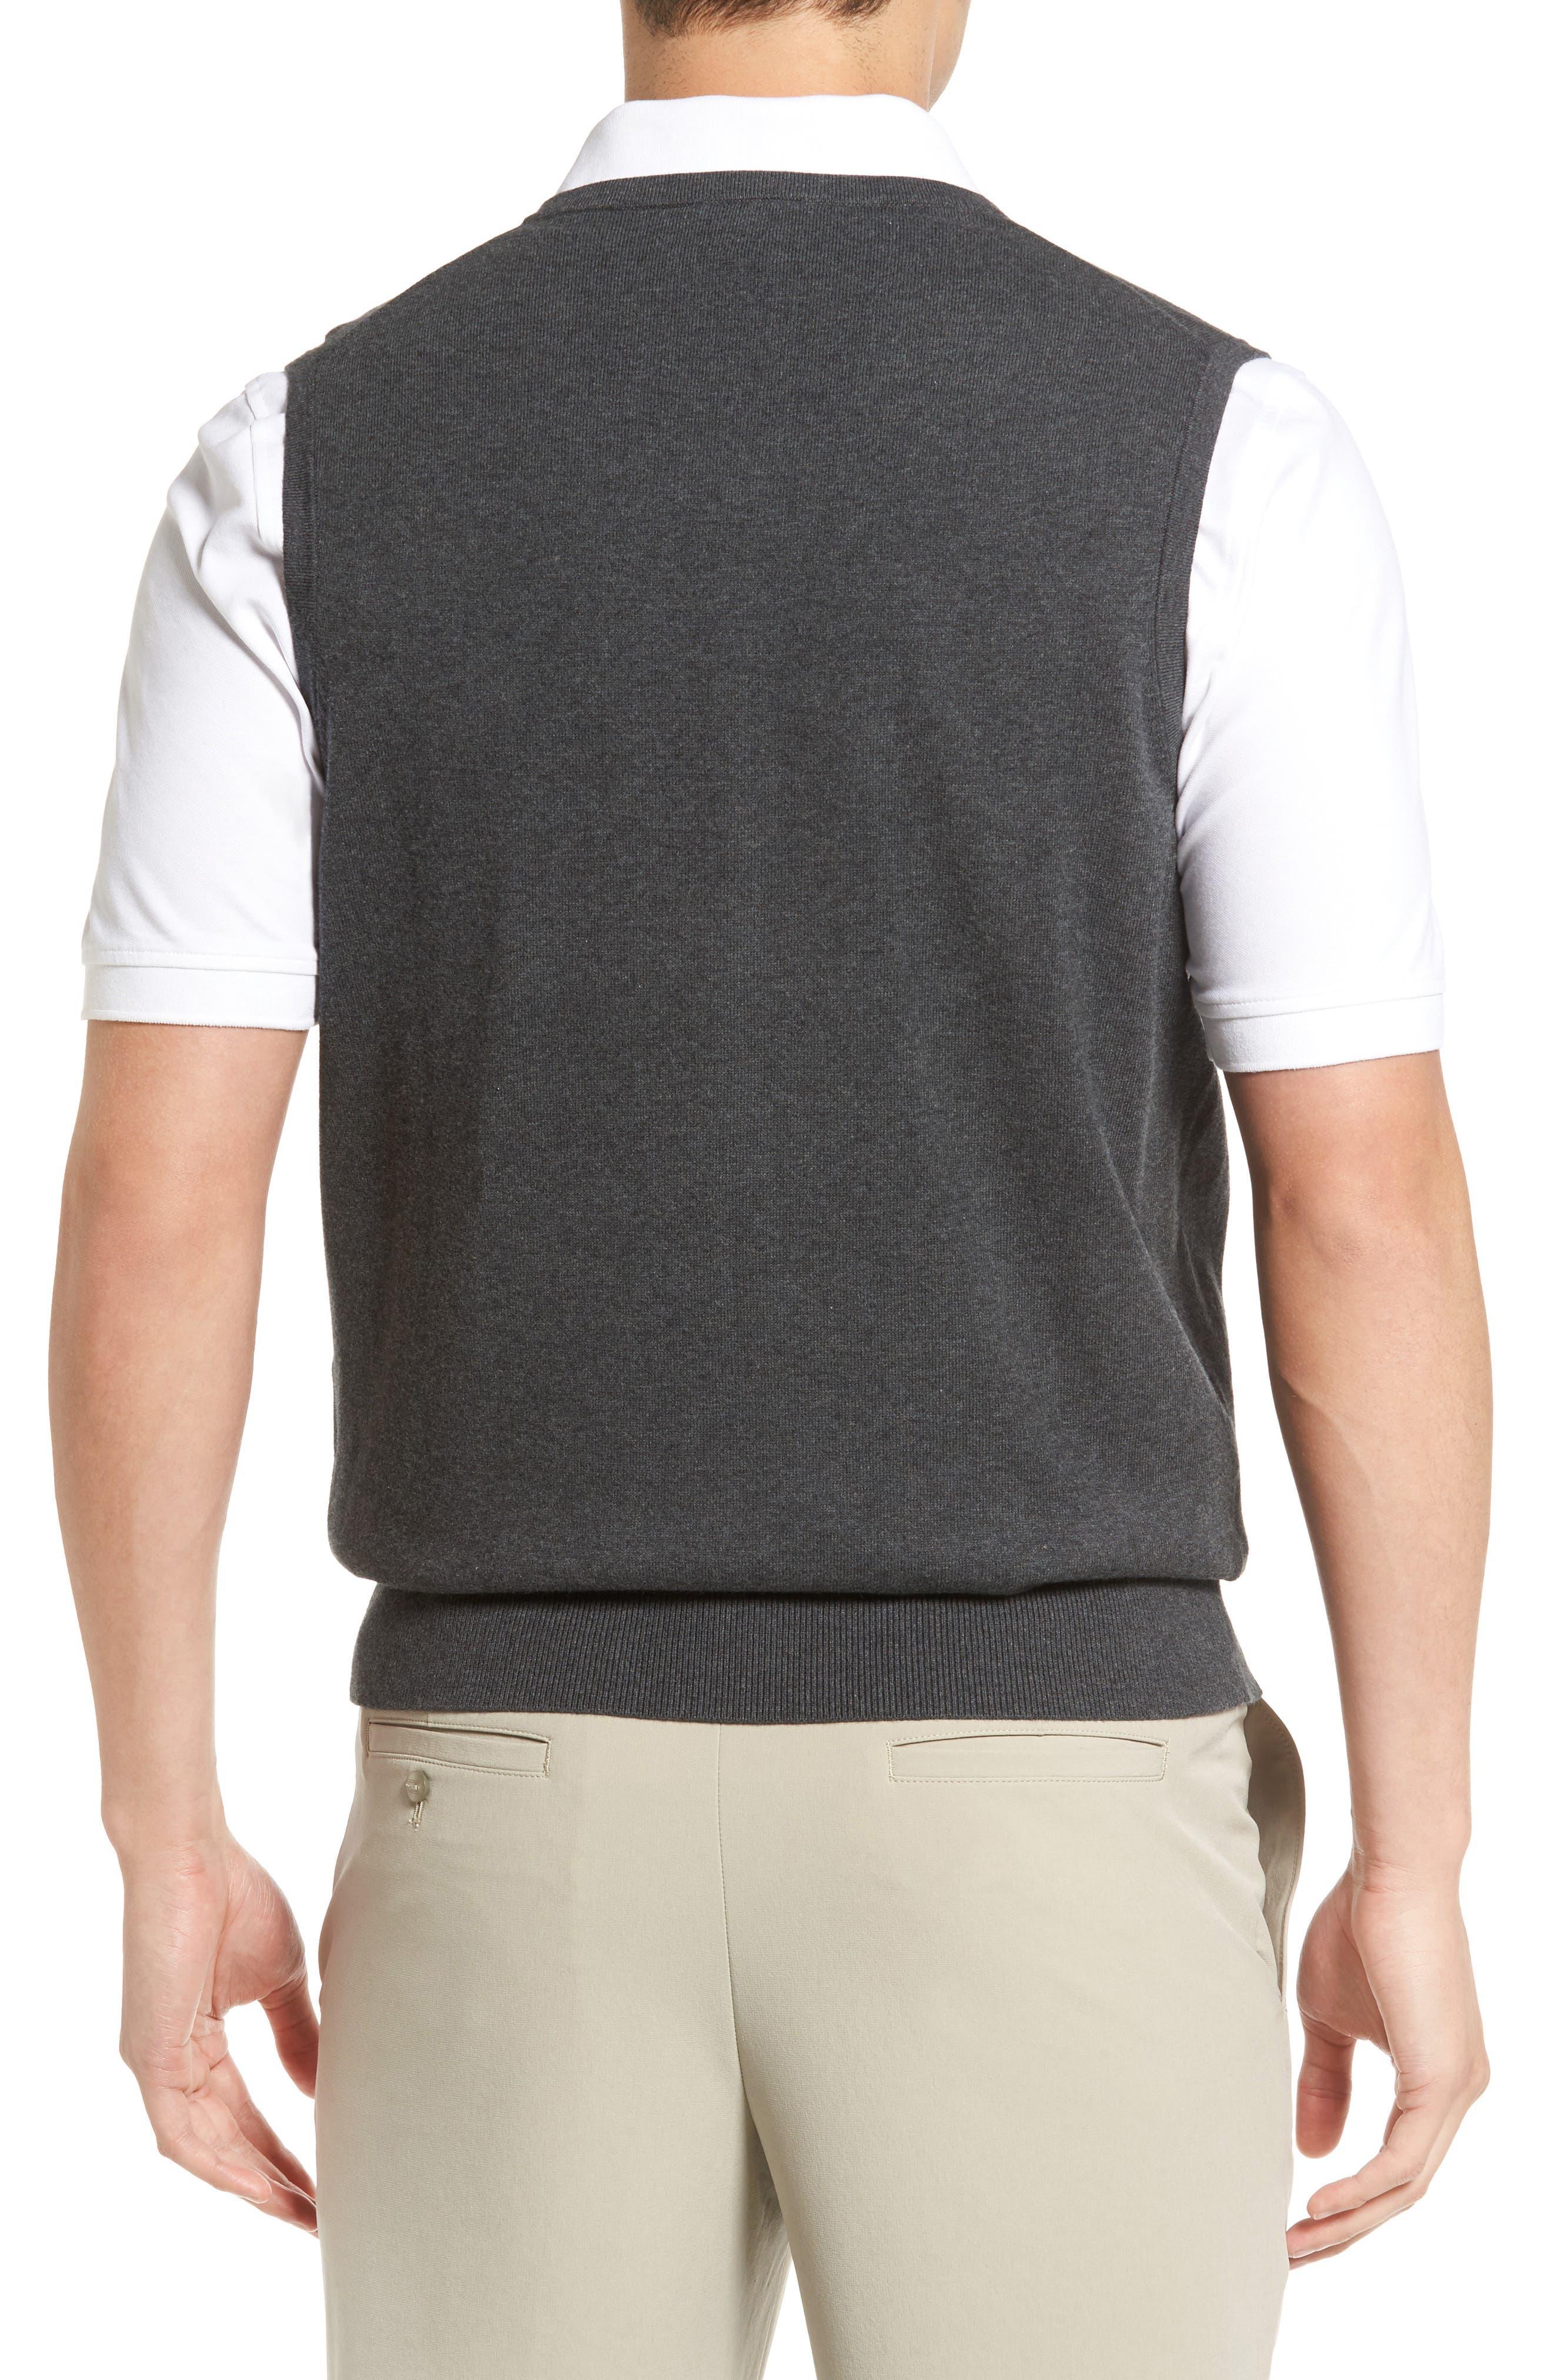 Lakemont V-Neck Sweater Vest,                             Alternate thumbnail 2, color,                             CHARCOAL HEATHER